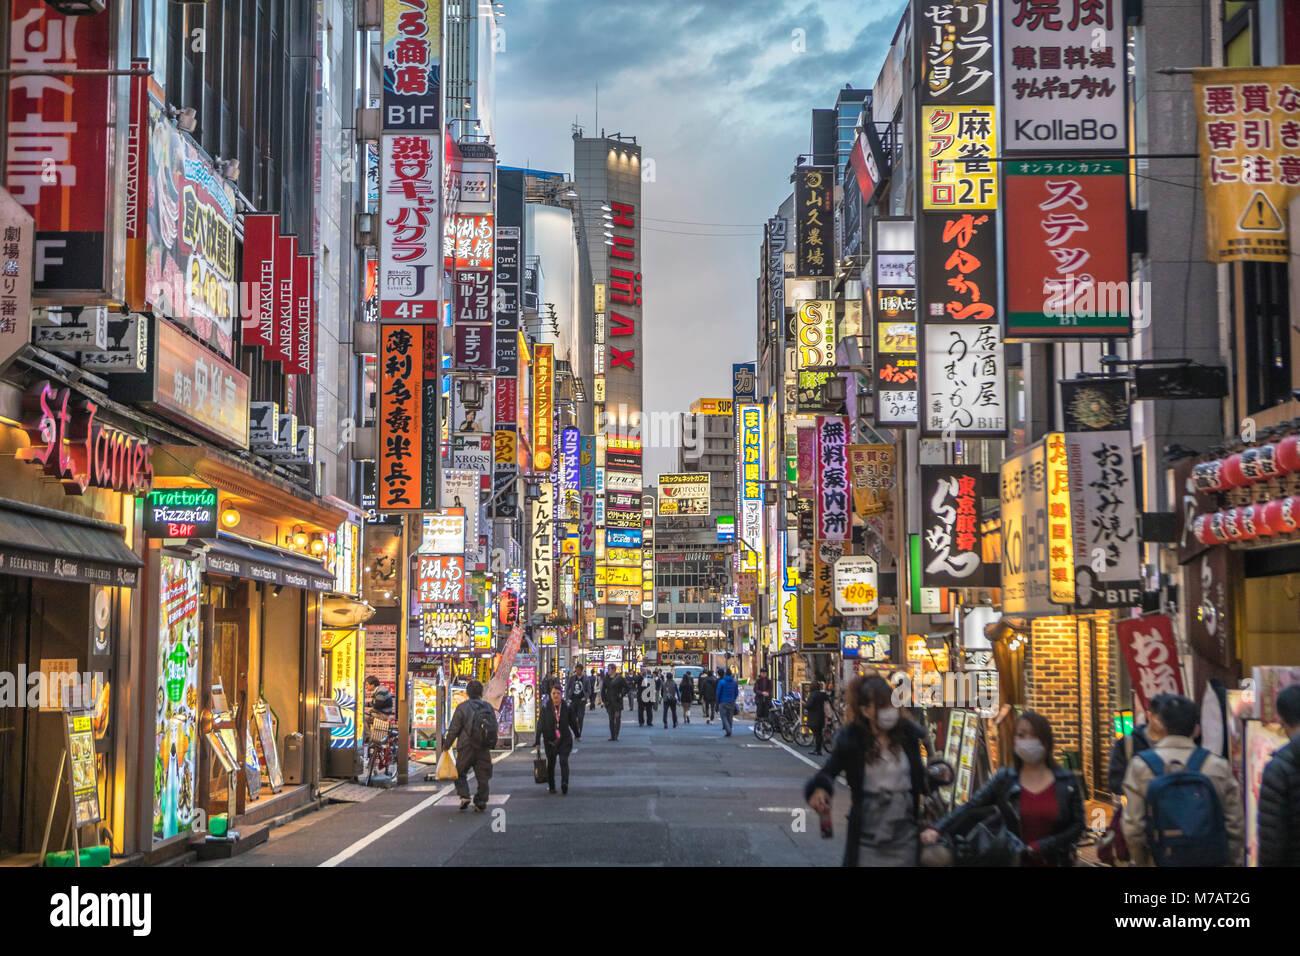 Japan, Tokyo City, Shinjuku District, Kabukicho area, - Stock Image